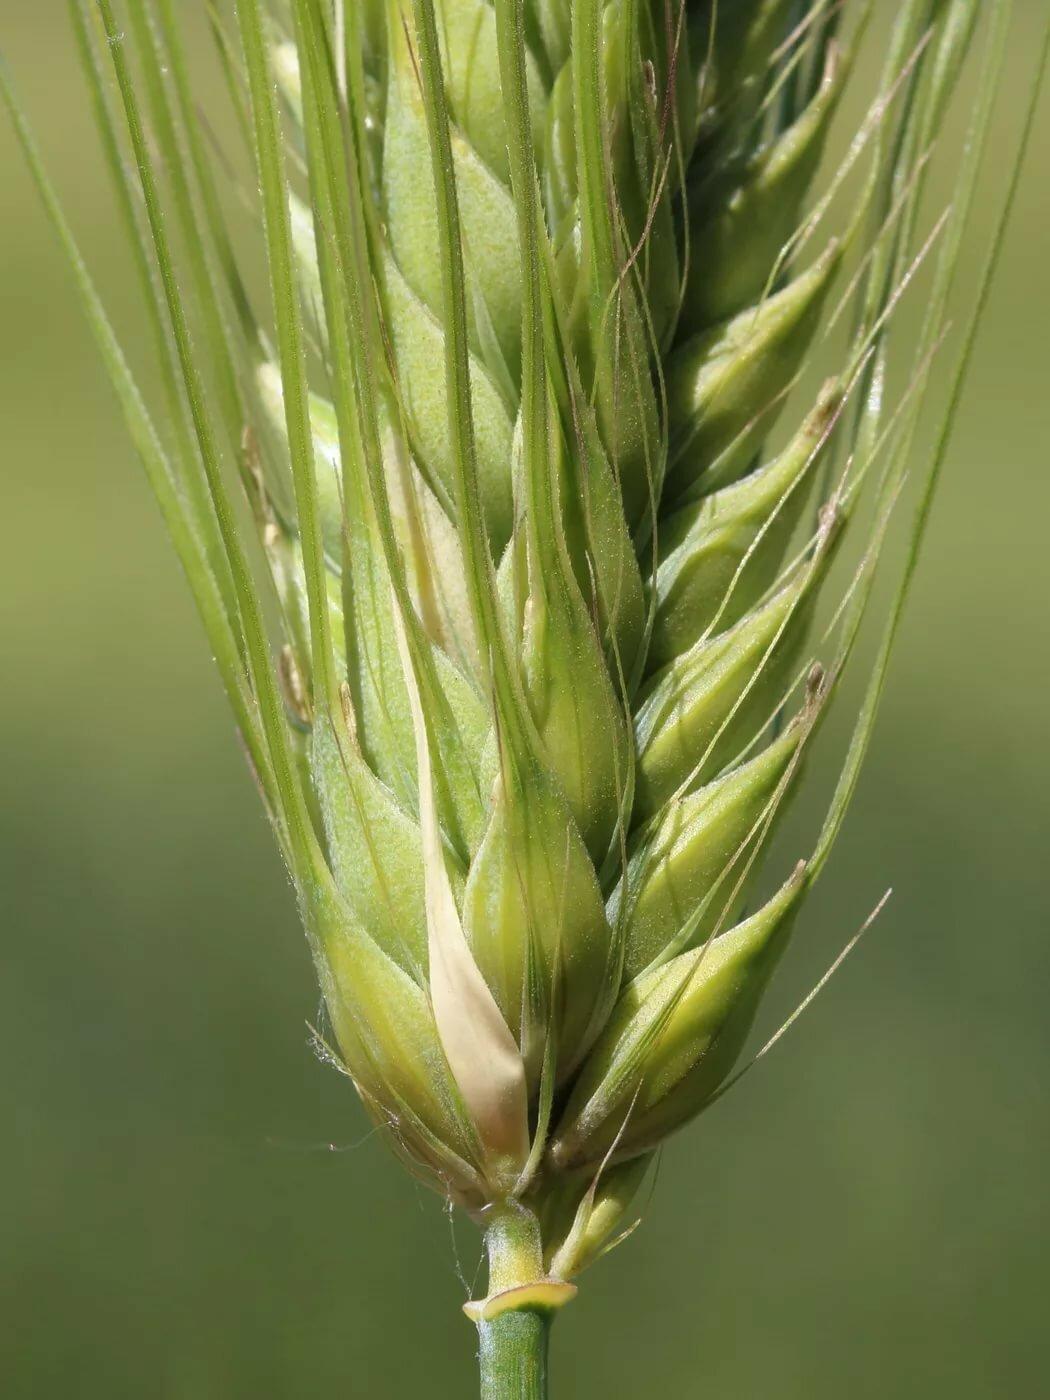 картинки злаковых трав образ